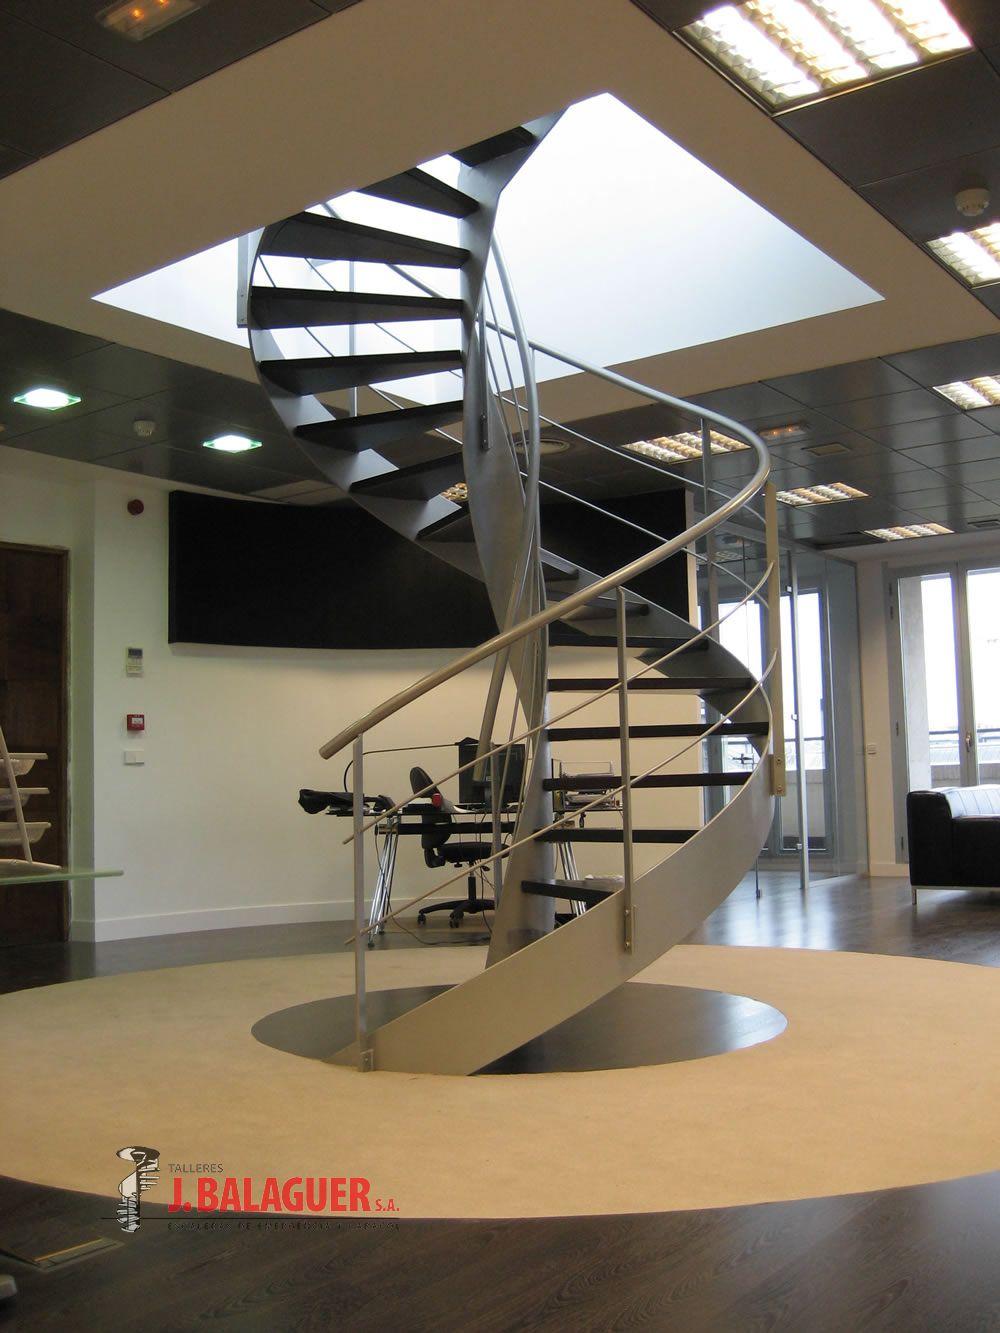 escaliers habitare et design escaleras balaguer. Black Bedroom Furniture Sets. Home Design Ideas